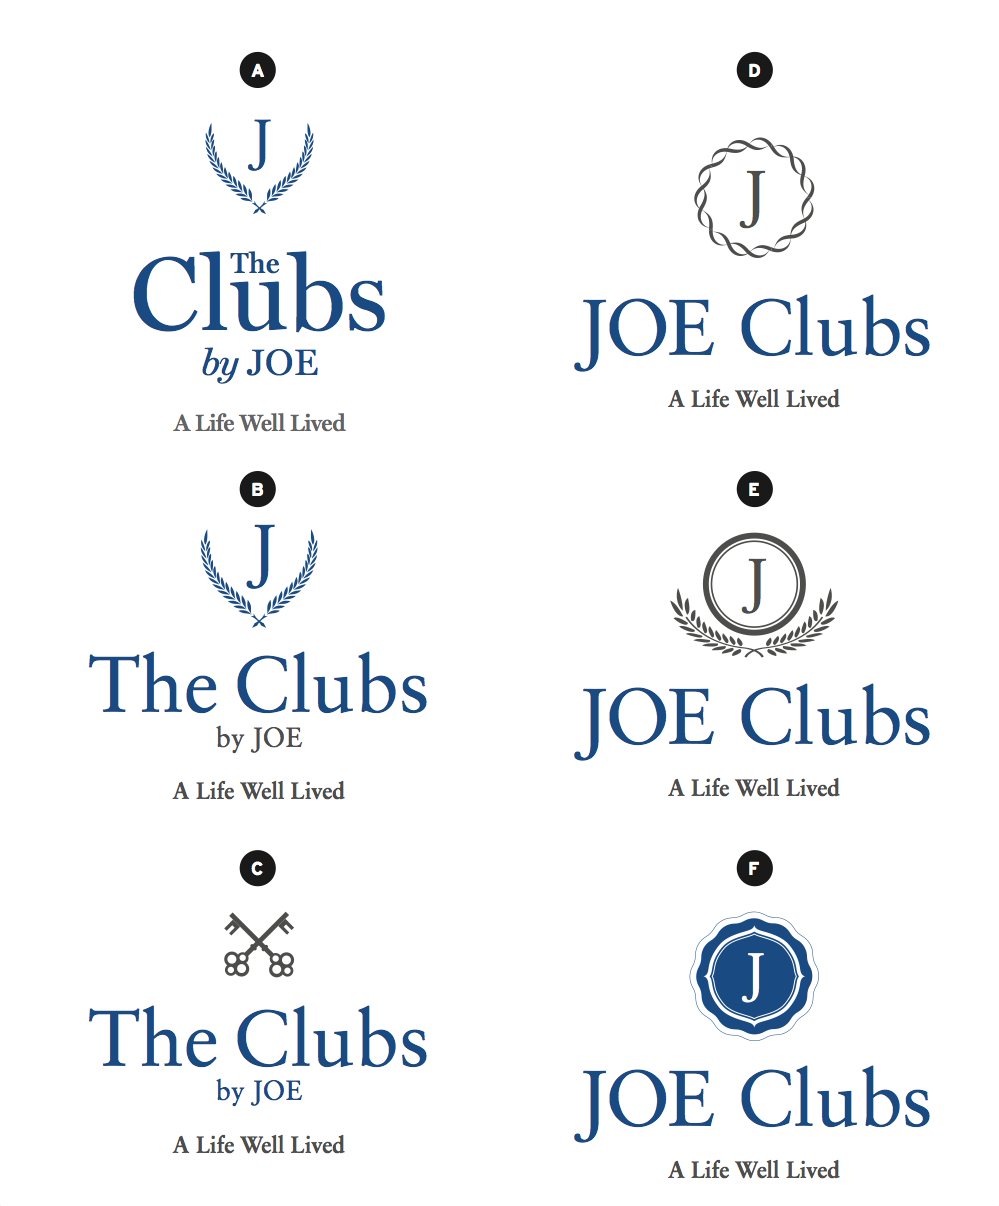 Design Process for St JOE's new logo